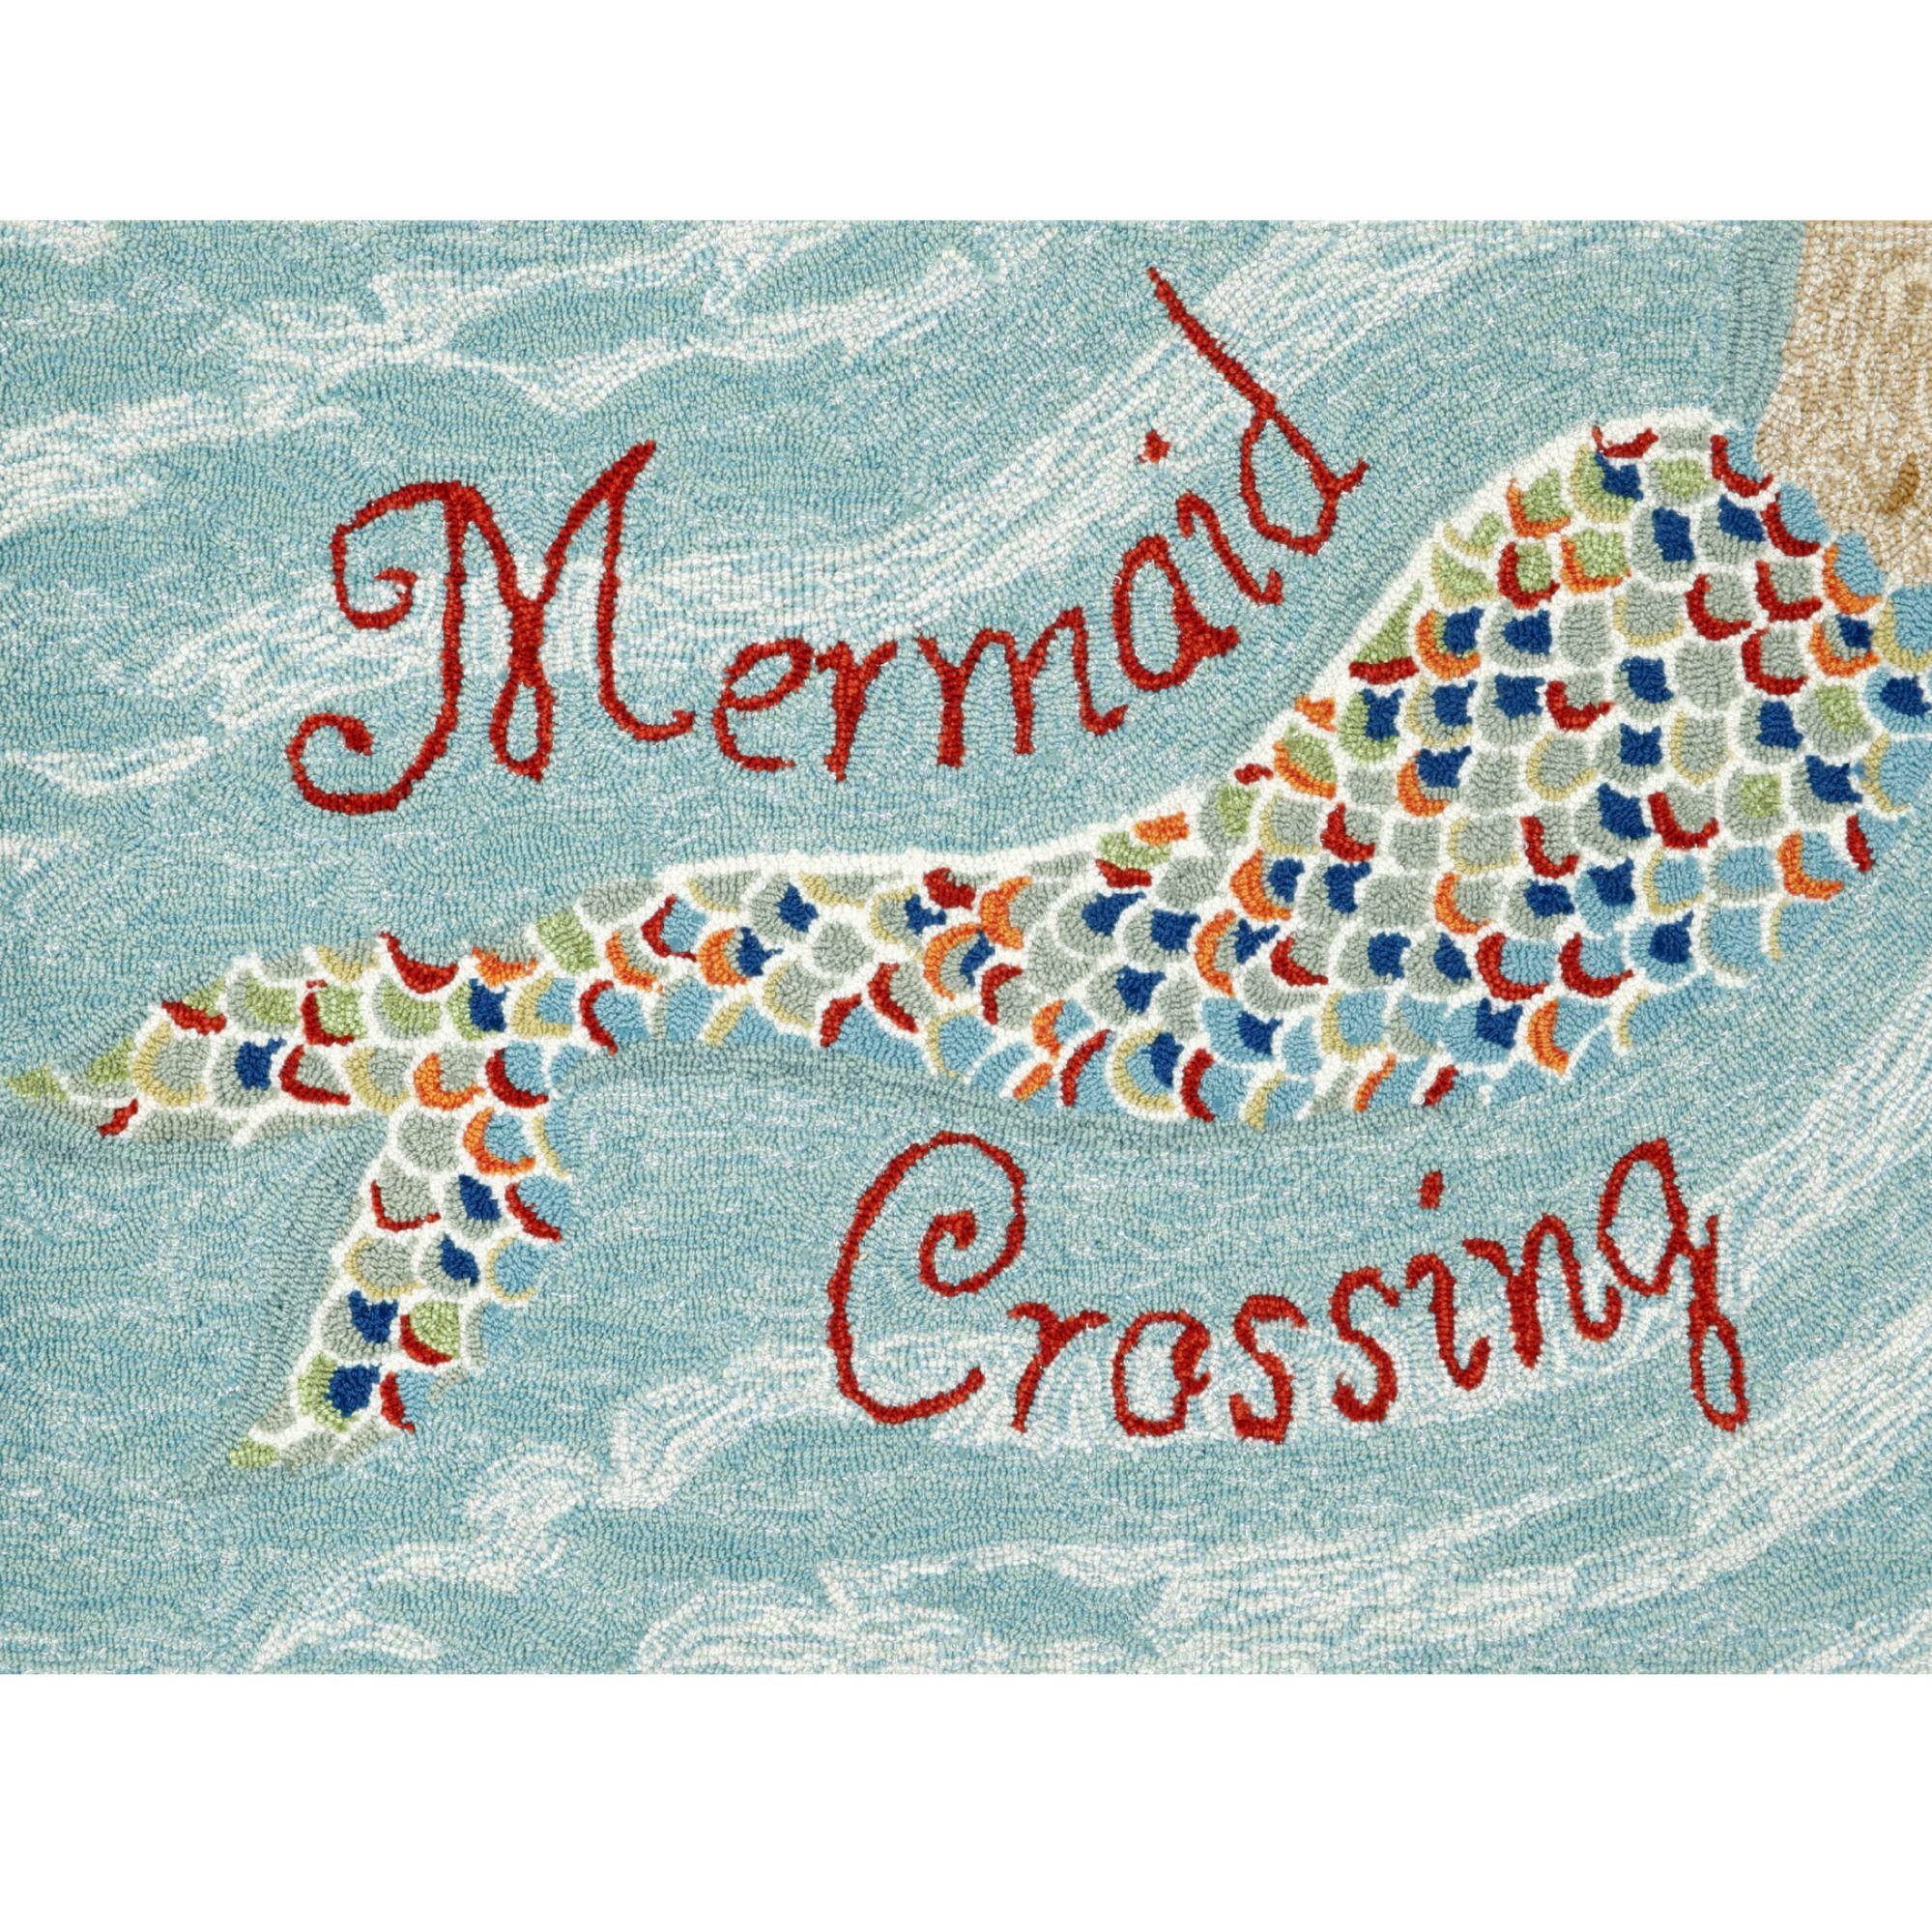 Ocean Inspired In Shades Of Ocean Blue The Mermaid Crossing 30 X 48 Mat Is Made Of Weather Resistant Fiber For Liora Manne Mermaid Decor Indoor Outdoor Rugs